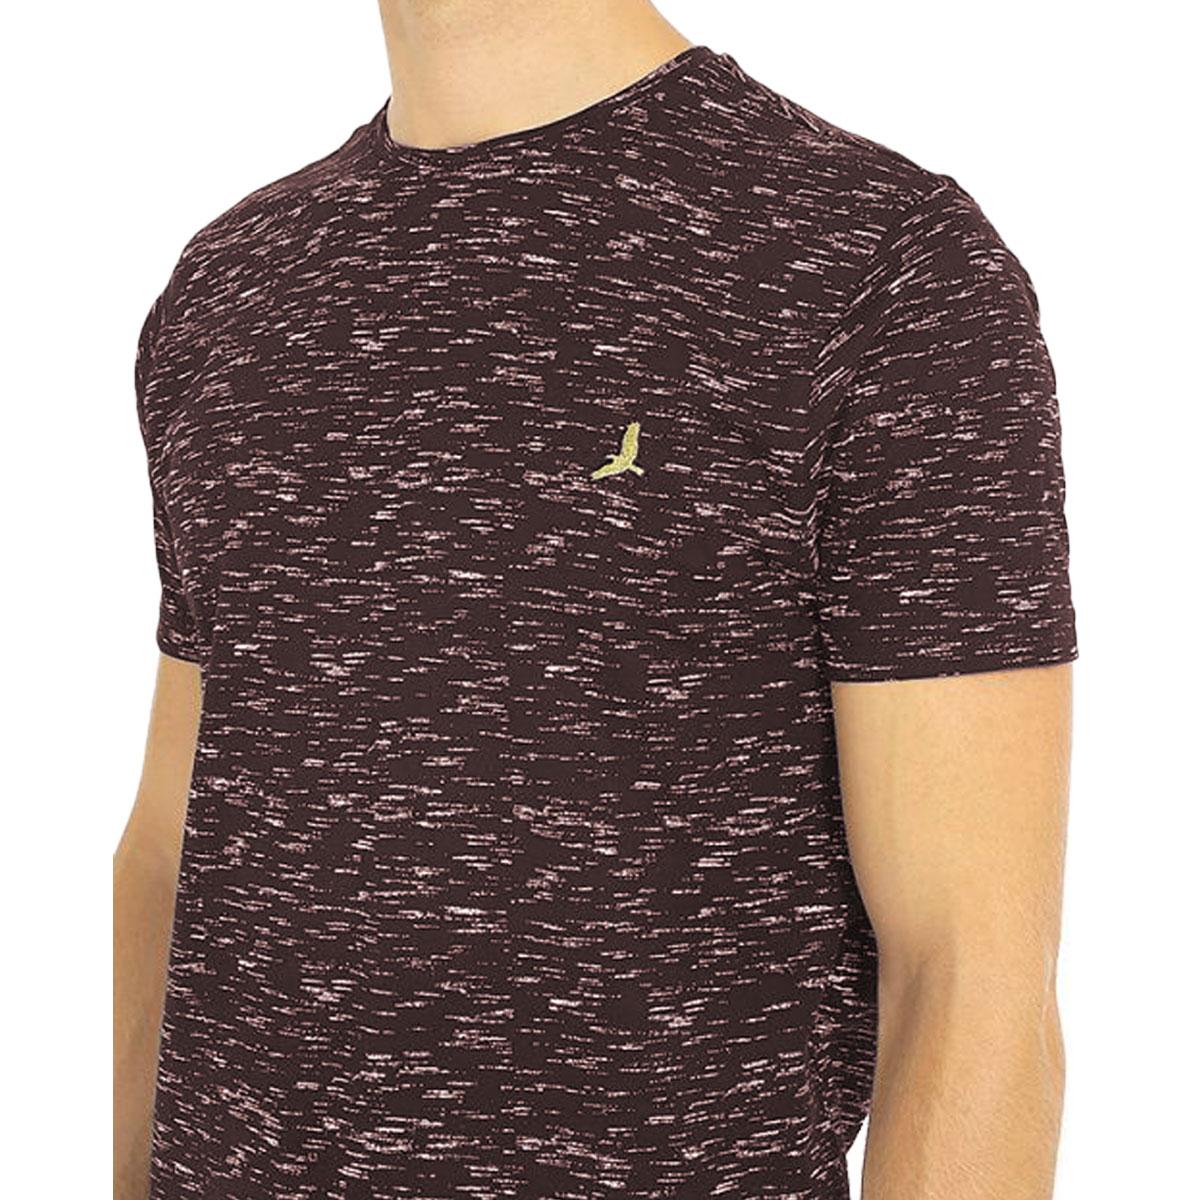 Brave-Soul-Mens-T-Shirt-Slub-Effect-Pattern-Design-Crew-Neck-Nigel thumbnail 13